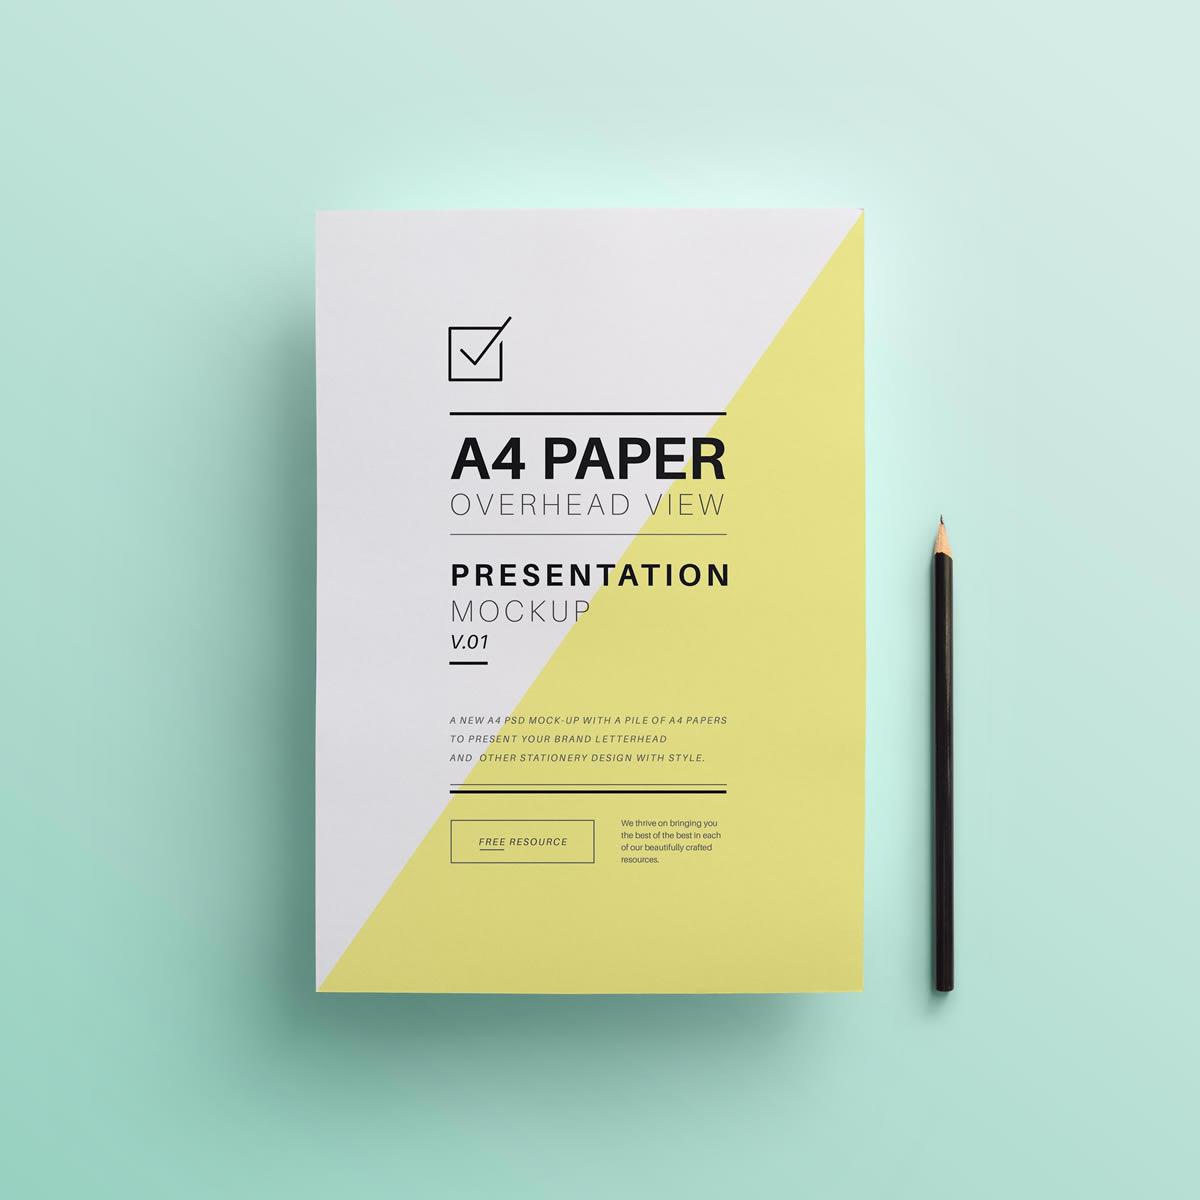 Hardcopy Presentation